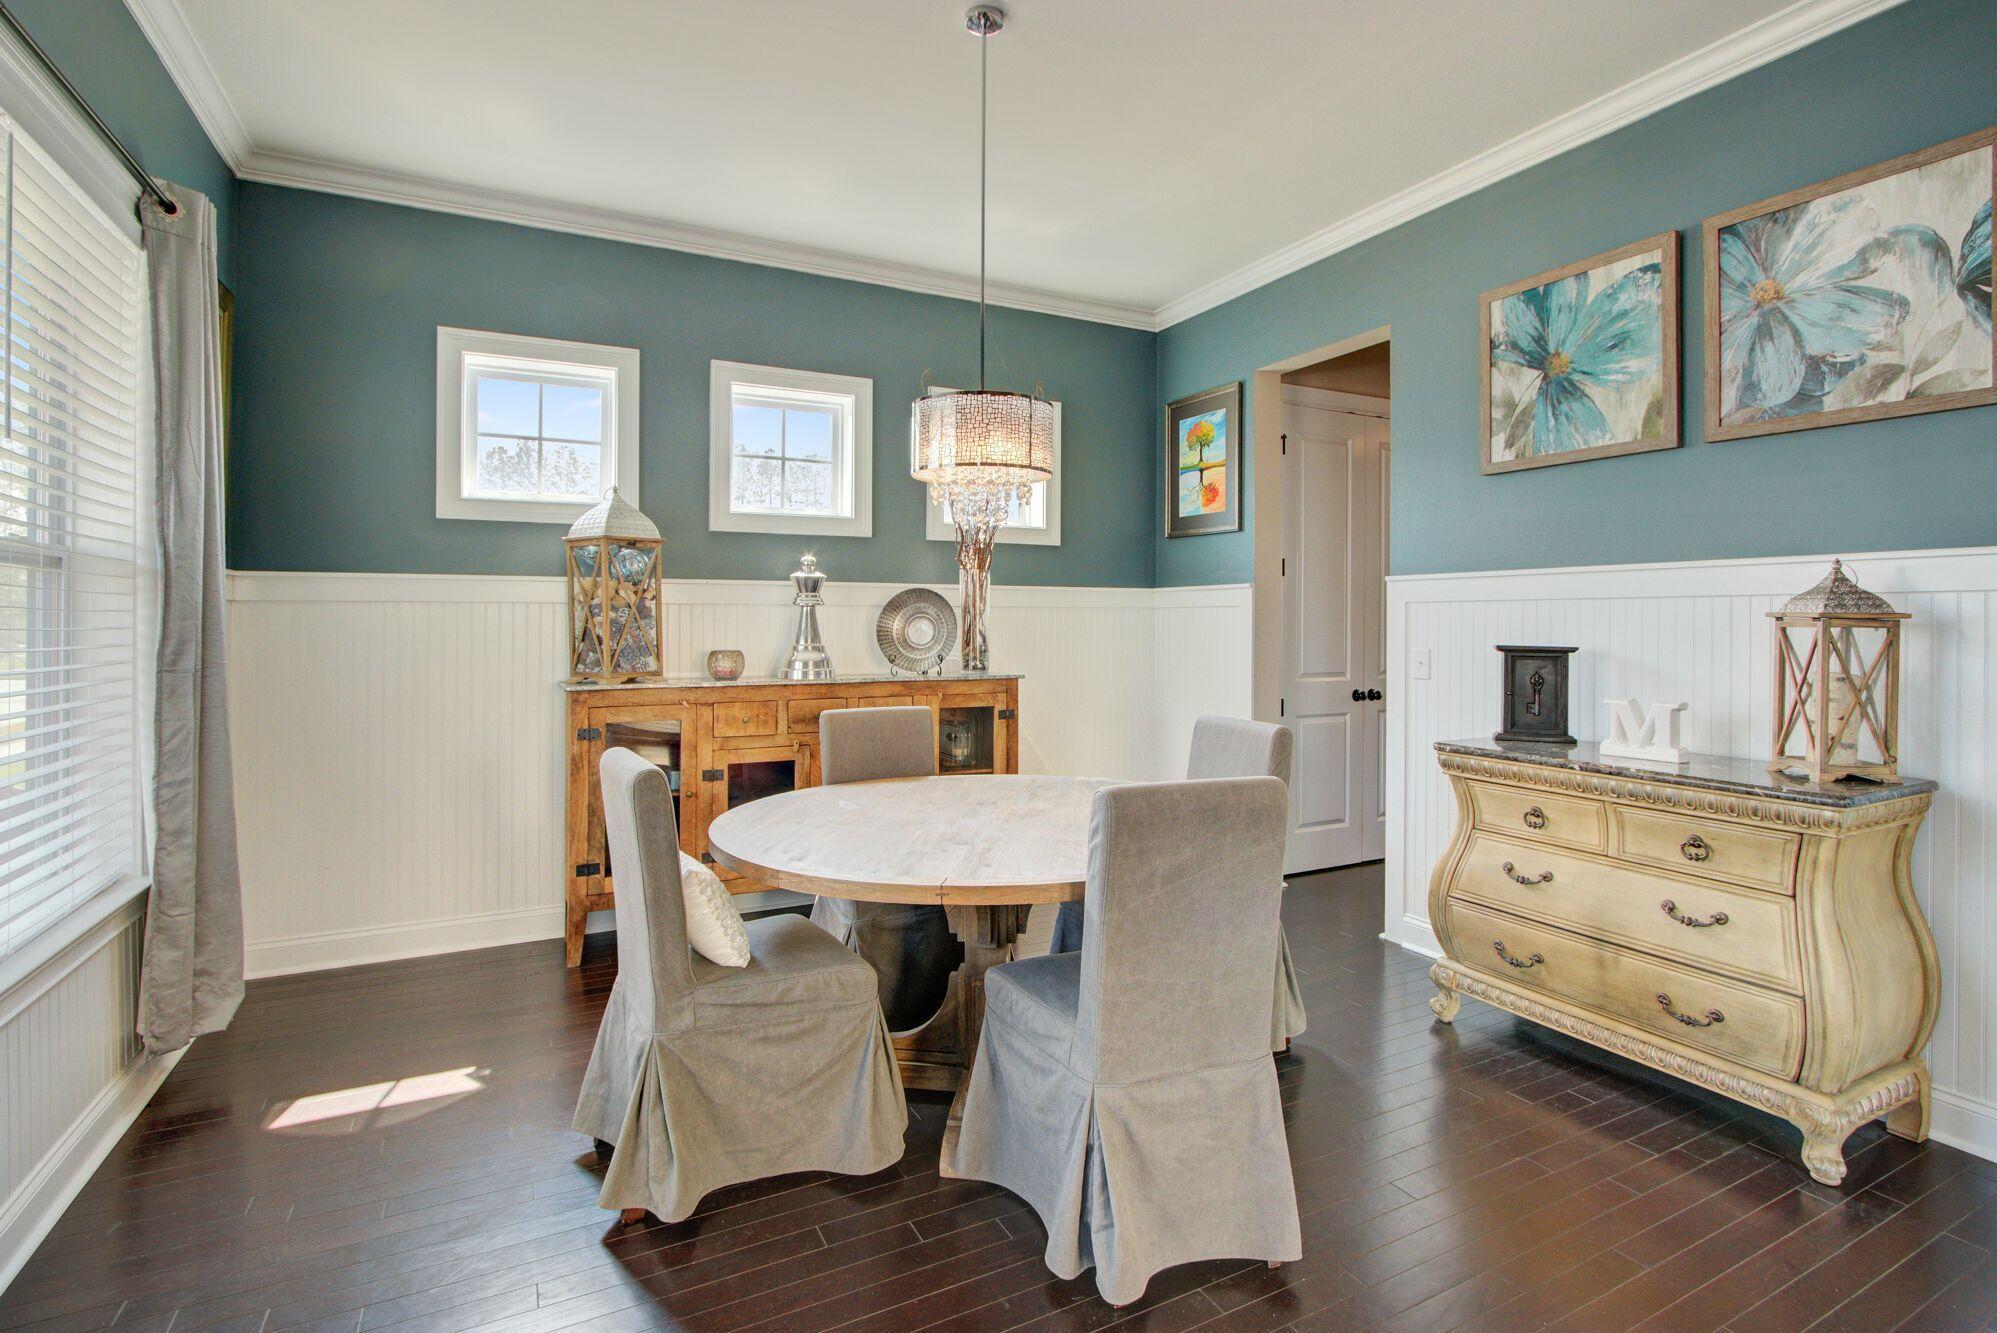 Carolina Park Homes For Sale - 3614 Shutesbury, Mount Pleasant, SC - 34